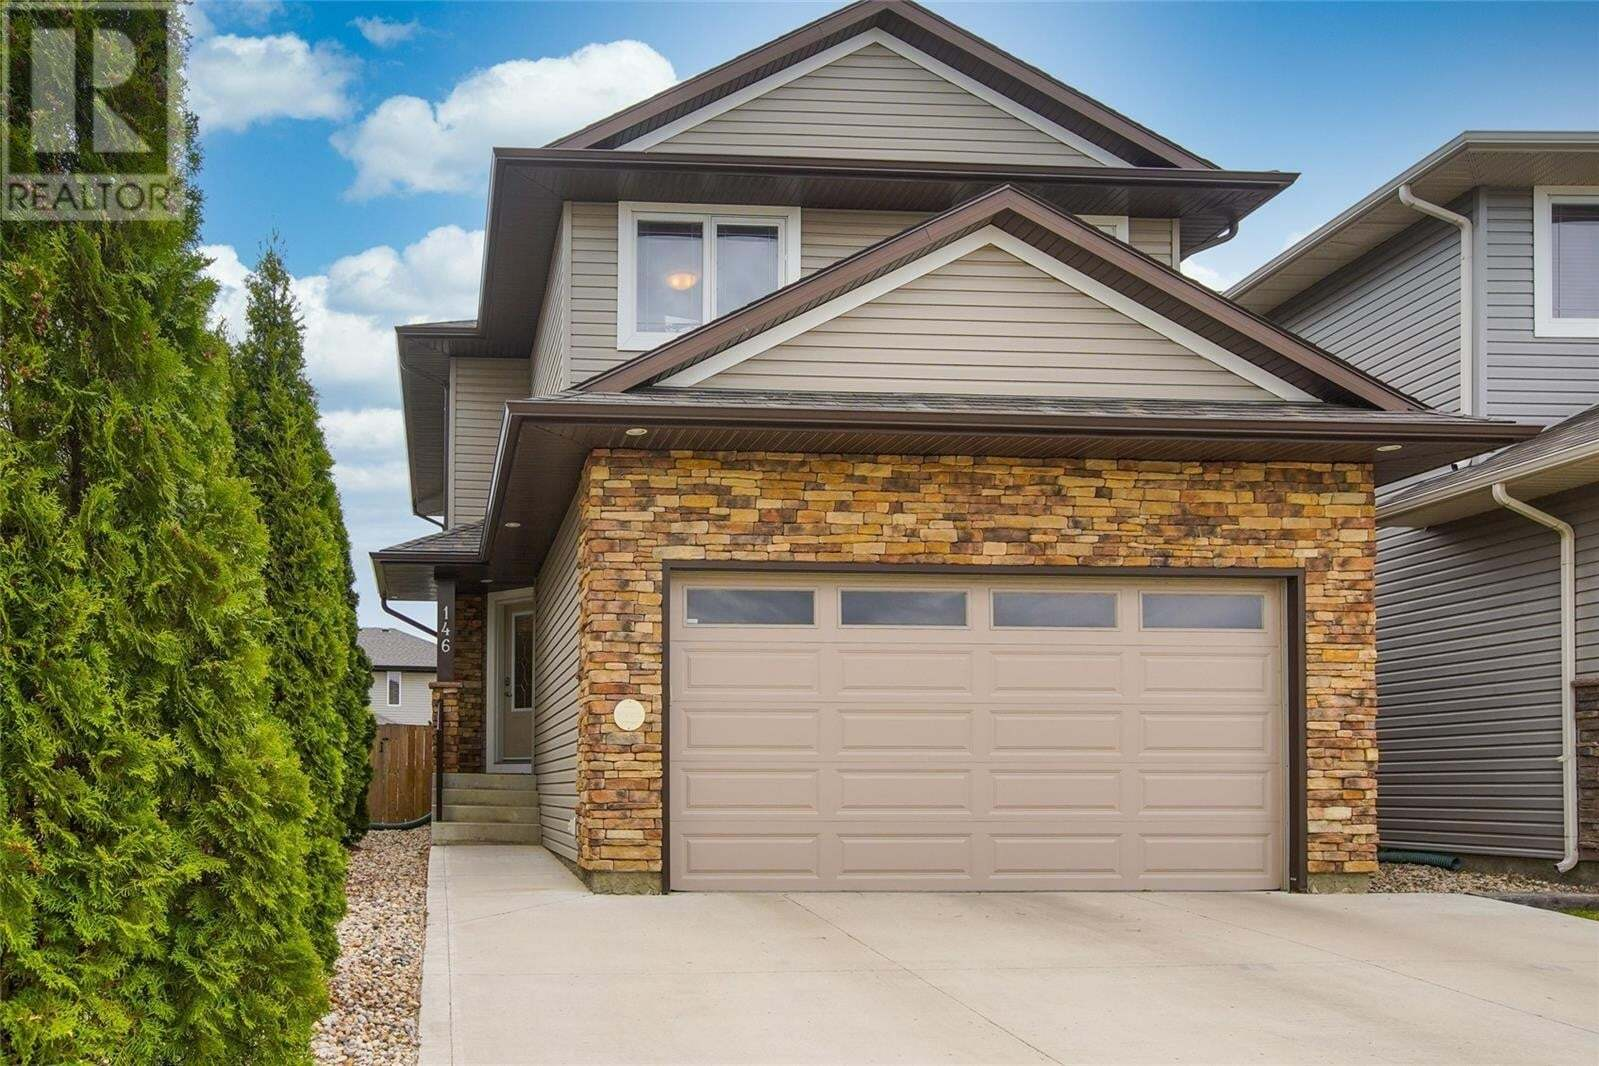 House for sale at 146 Ashworth Cres Saskatoon Saskatchewan - MLS: SK814307